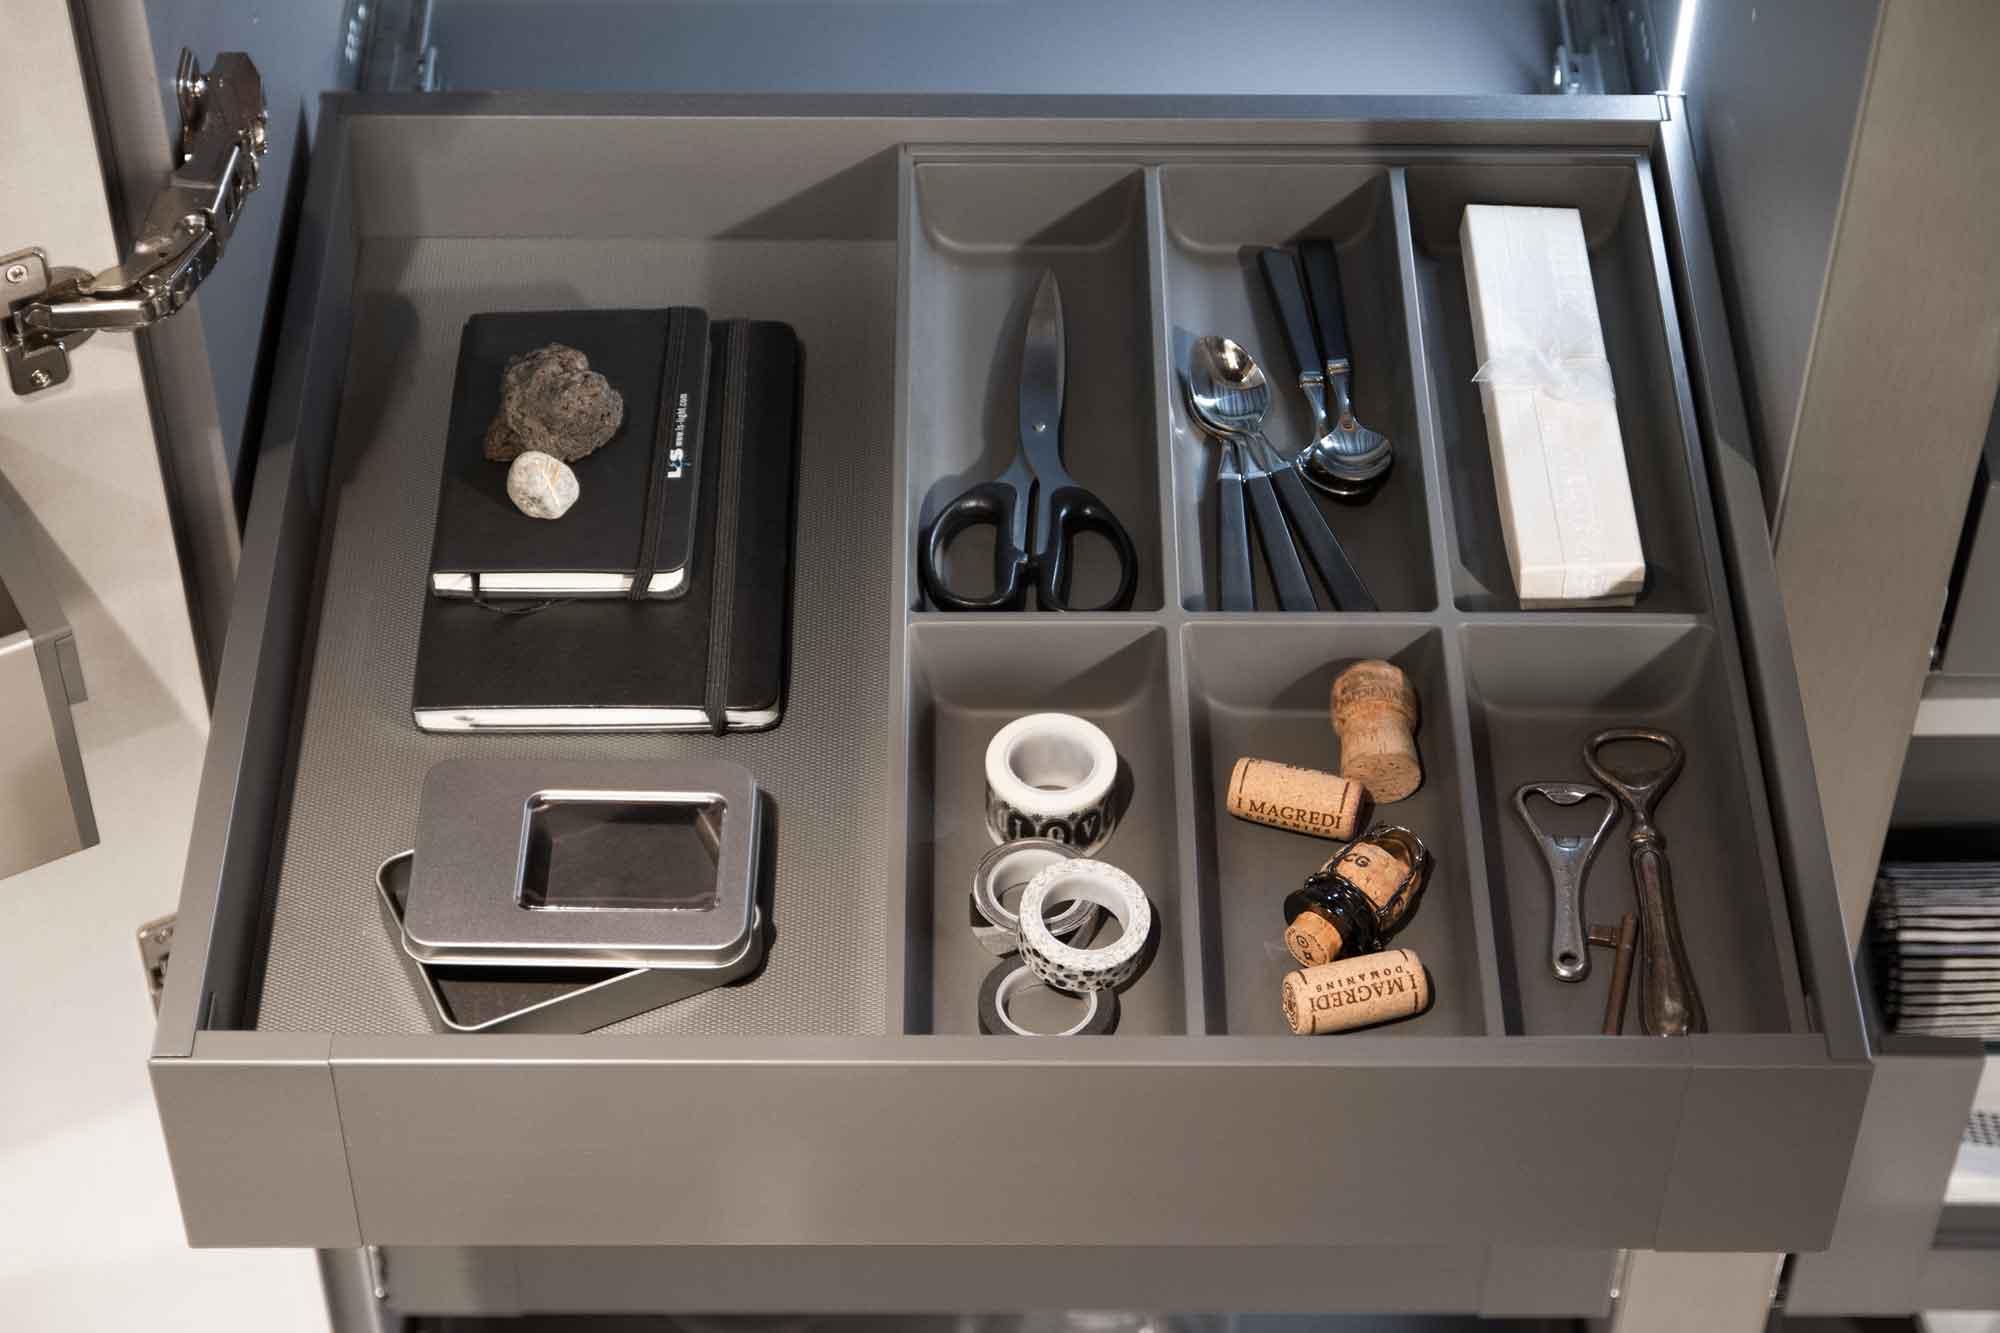 Cucina_moderna_cassetto_interni